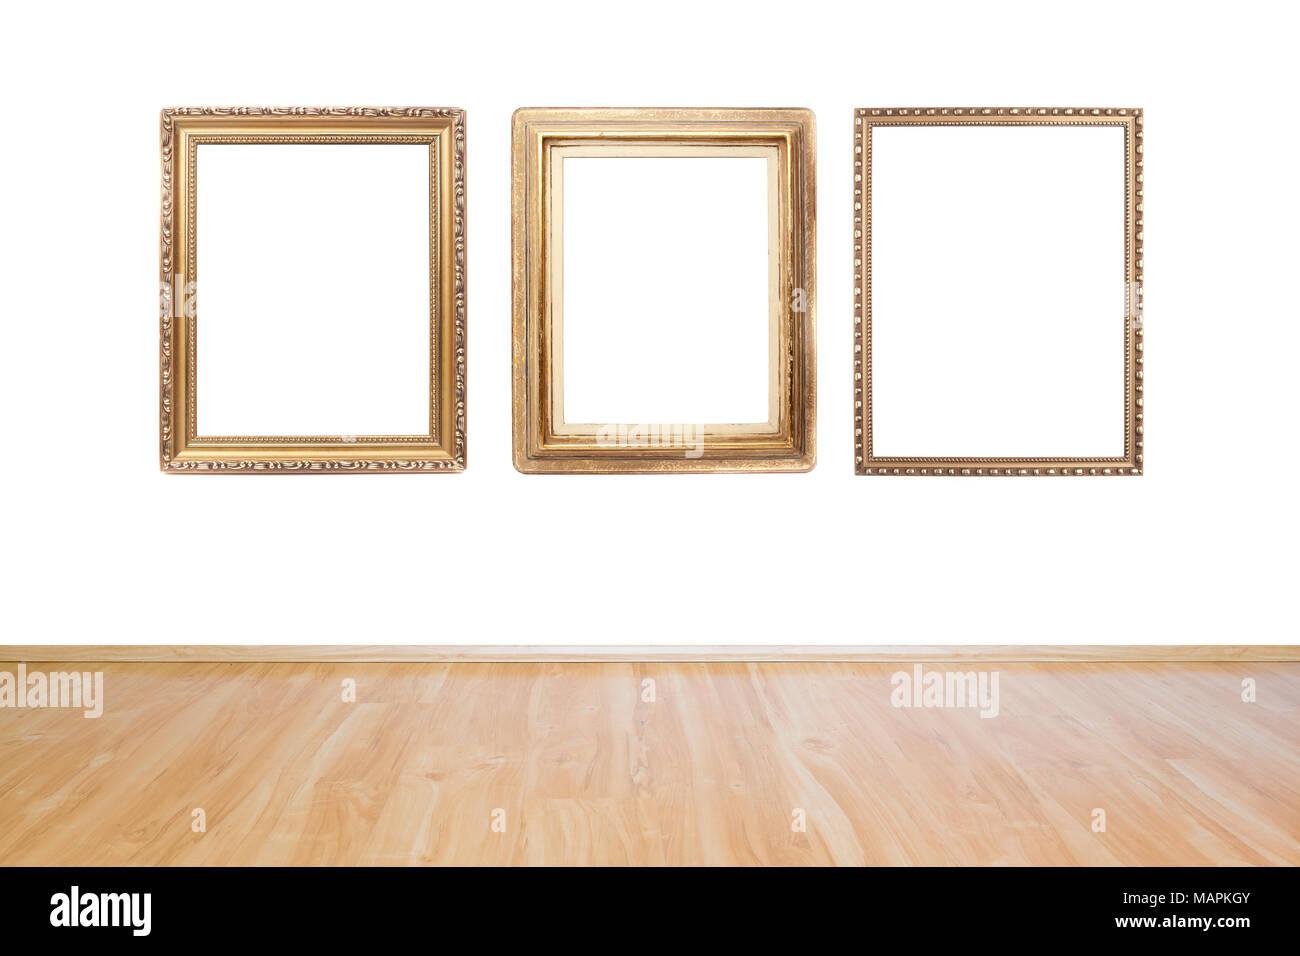 Fein Bilderrahmen An Der Wand Layout Galerie - Rahmen Ideen ...